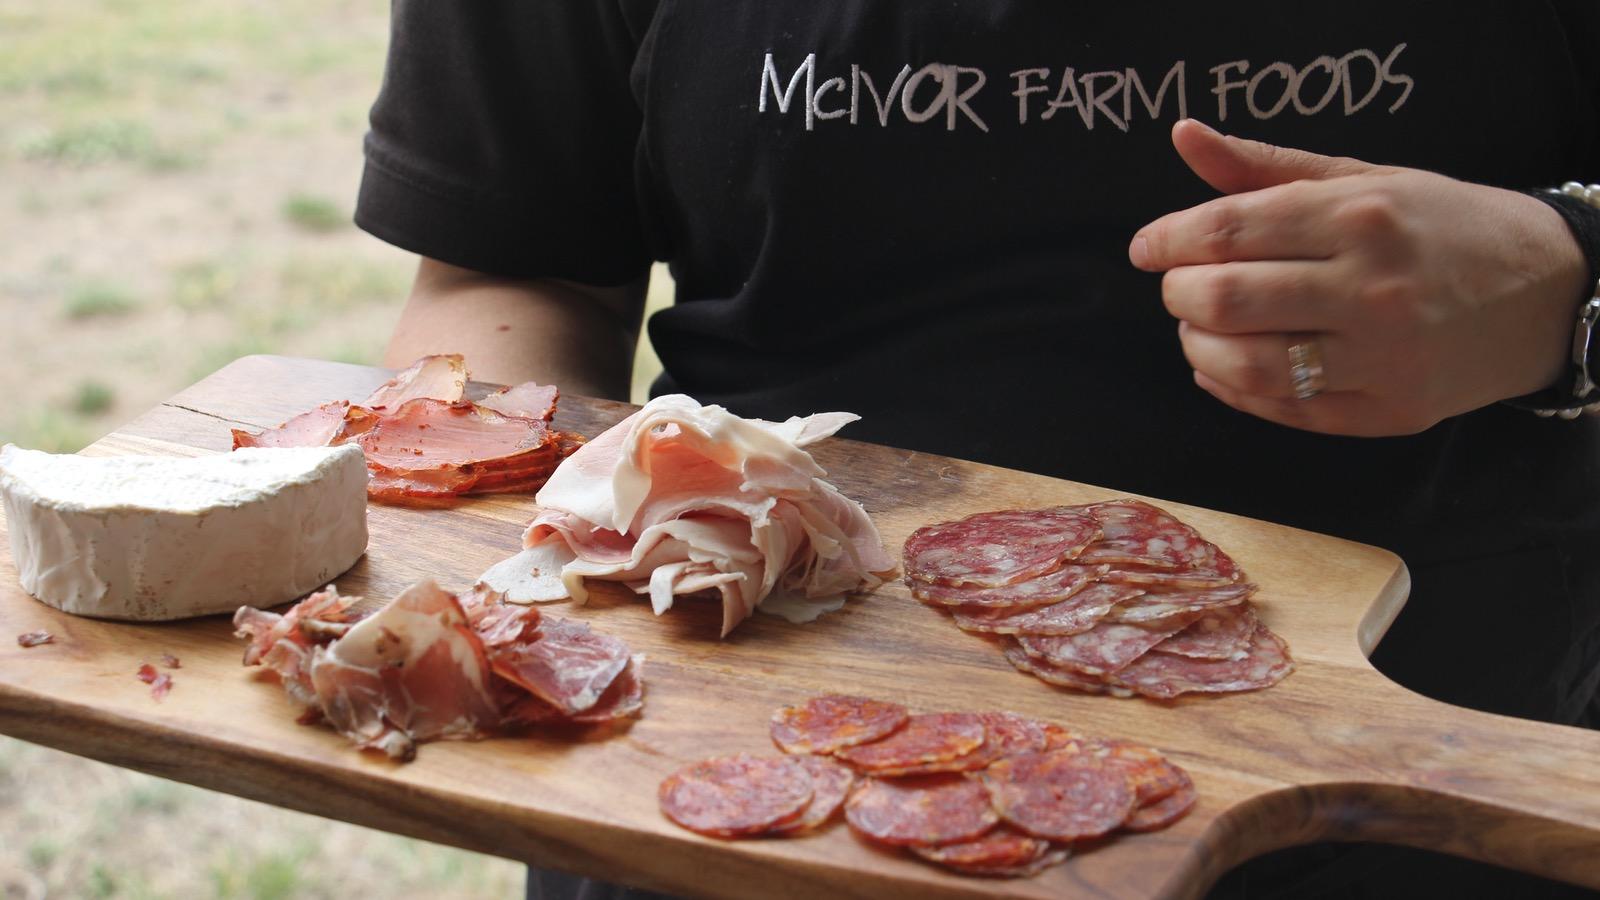 Lunch at McIvor Farm